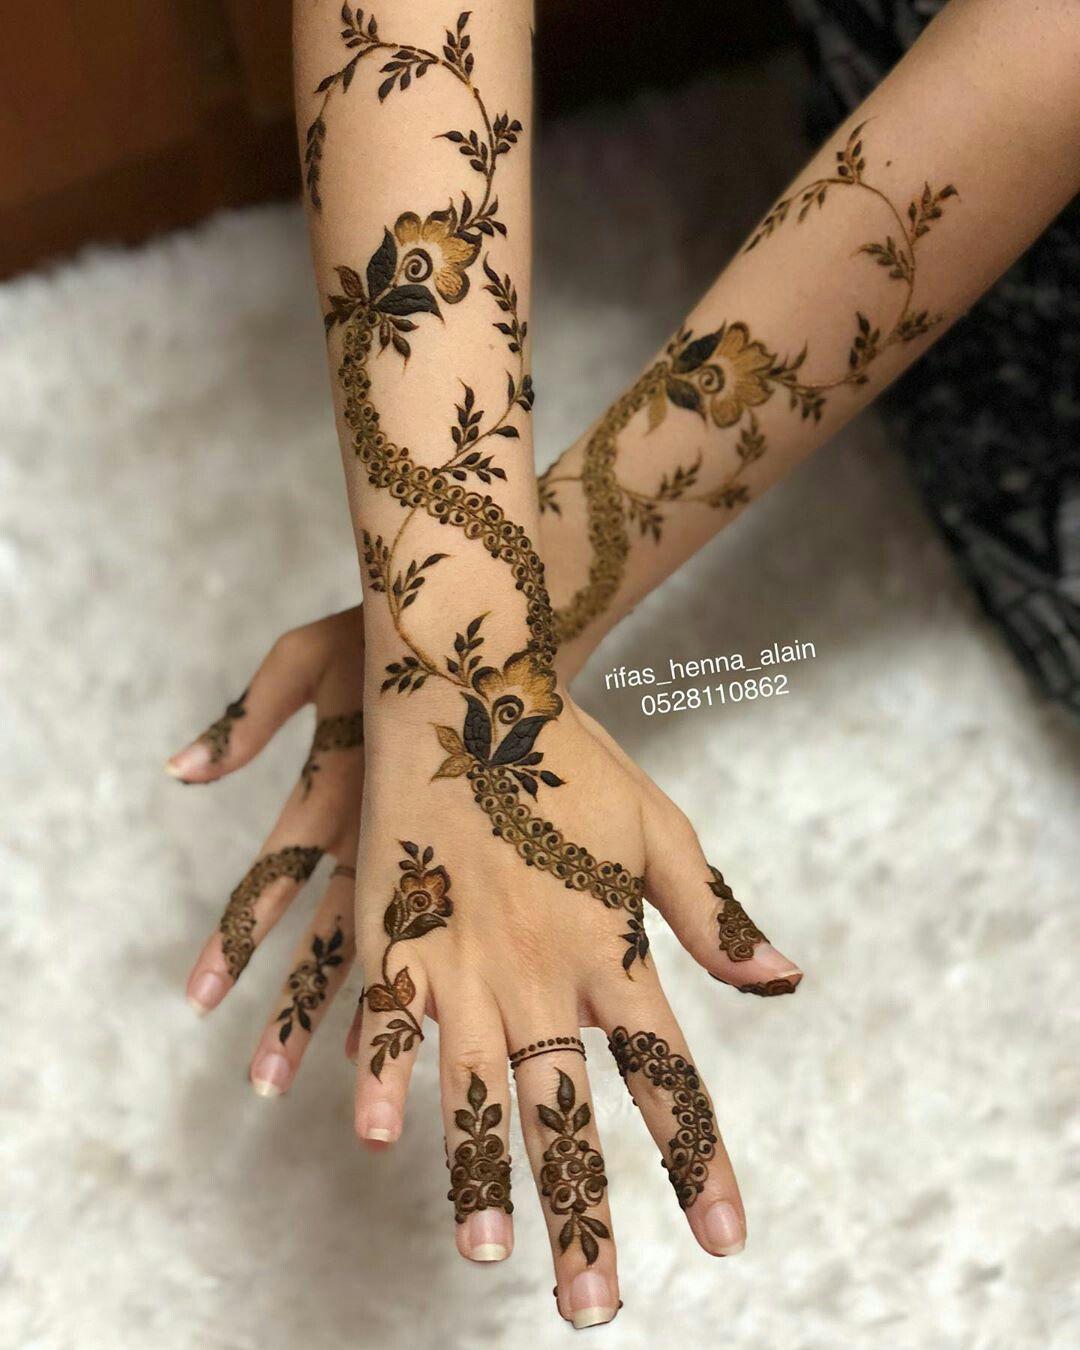 Pin By Samrmoohamad On نقشات حناء Mehndi Designs For Hands Mehndi Designs Hand Henna